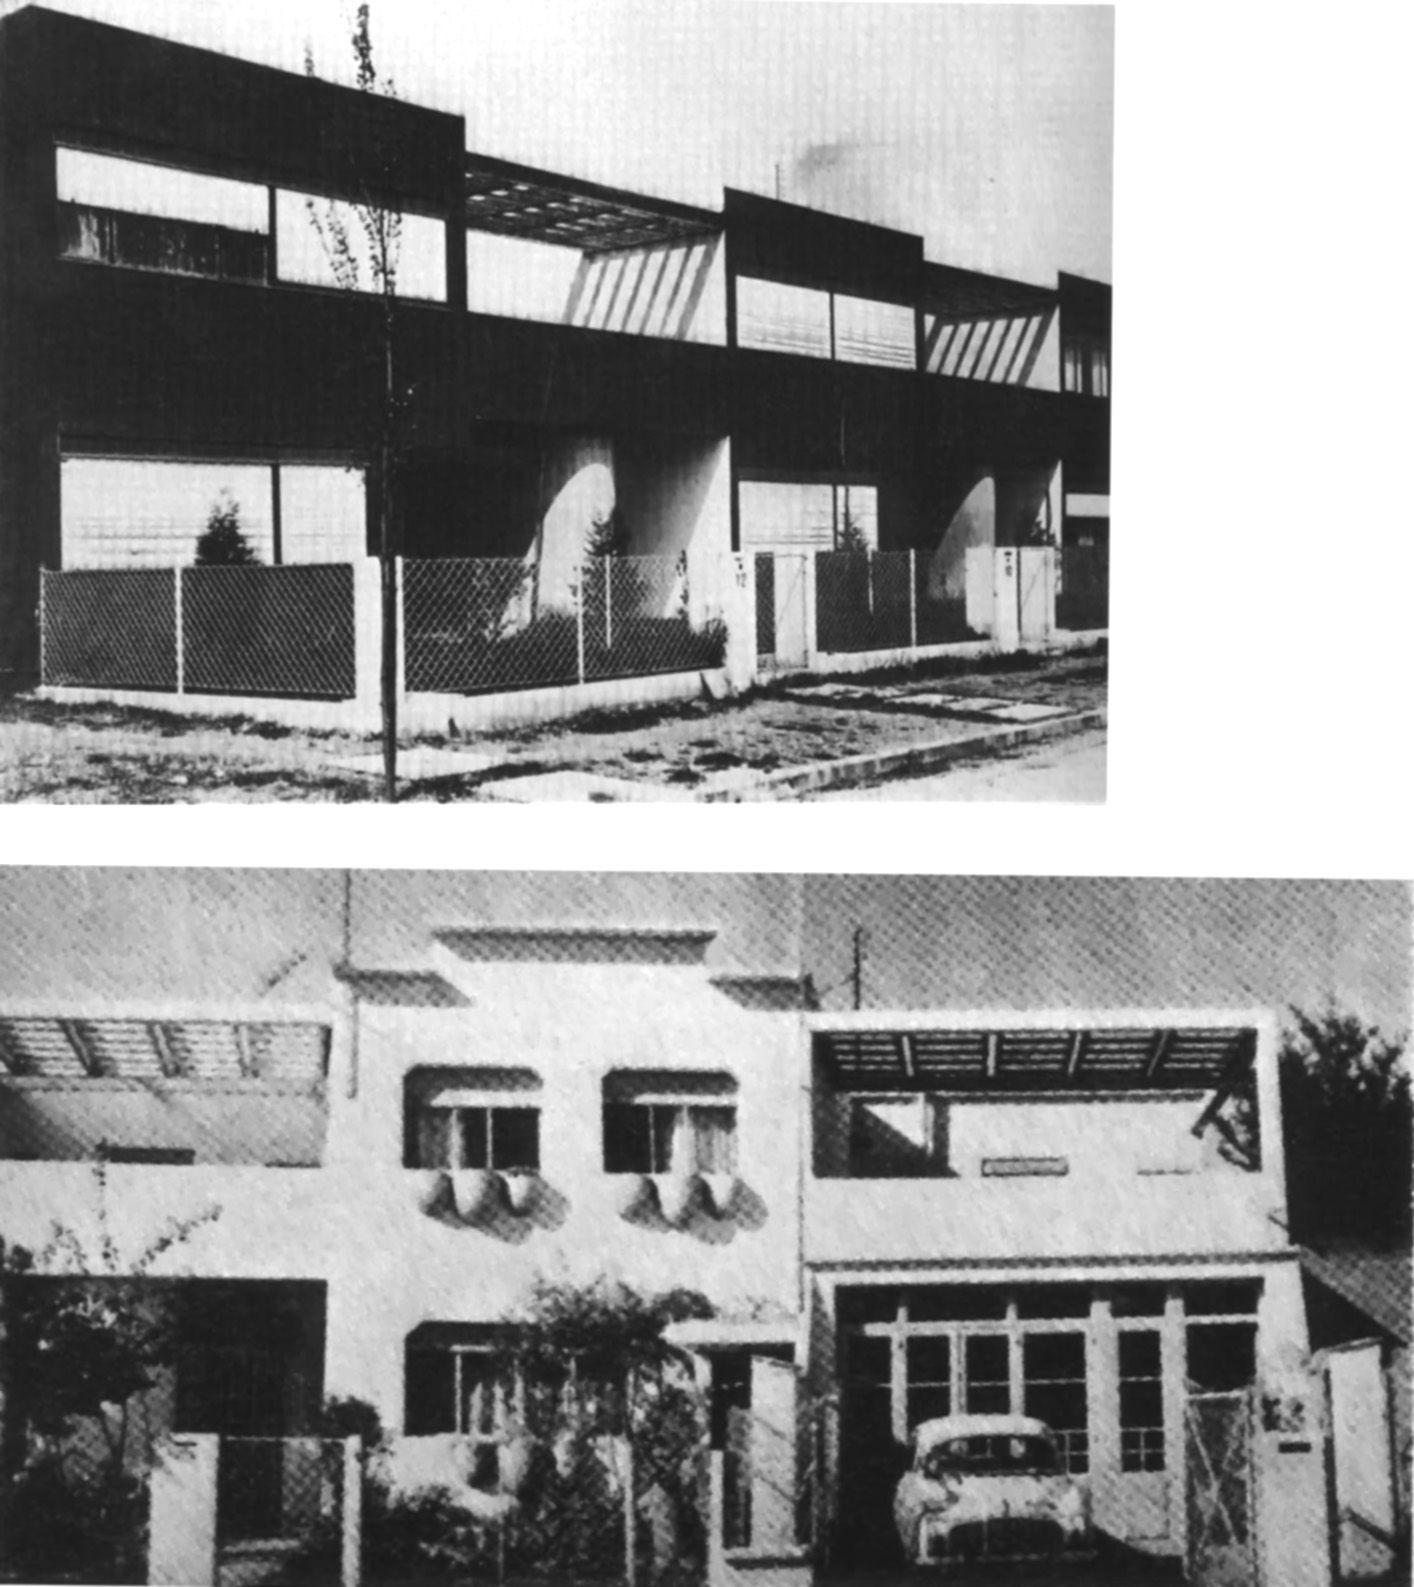 le corbusier pessac 1926 original state and transformed by inhabitants arch427 week5. Black Bedroom Furniture Sets. Home Design Ideas